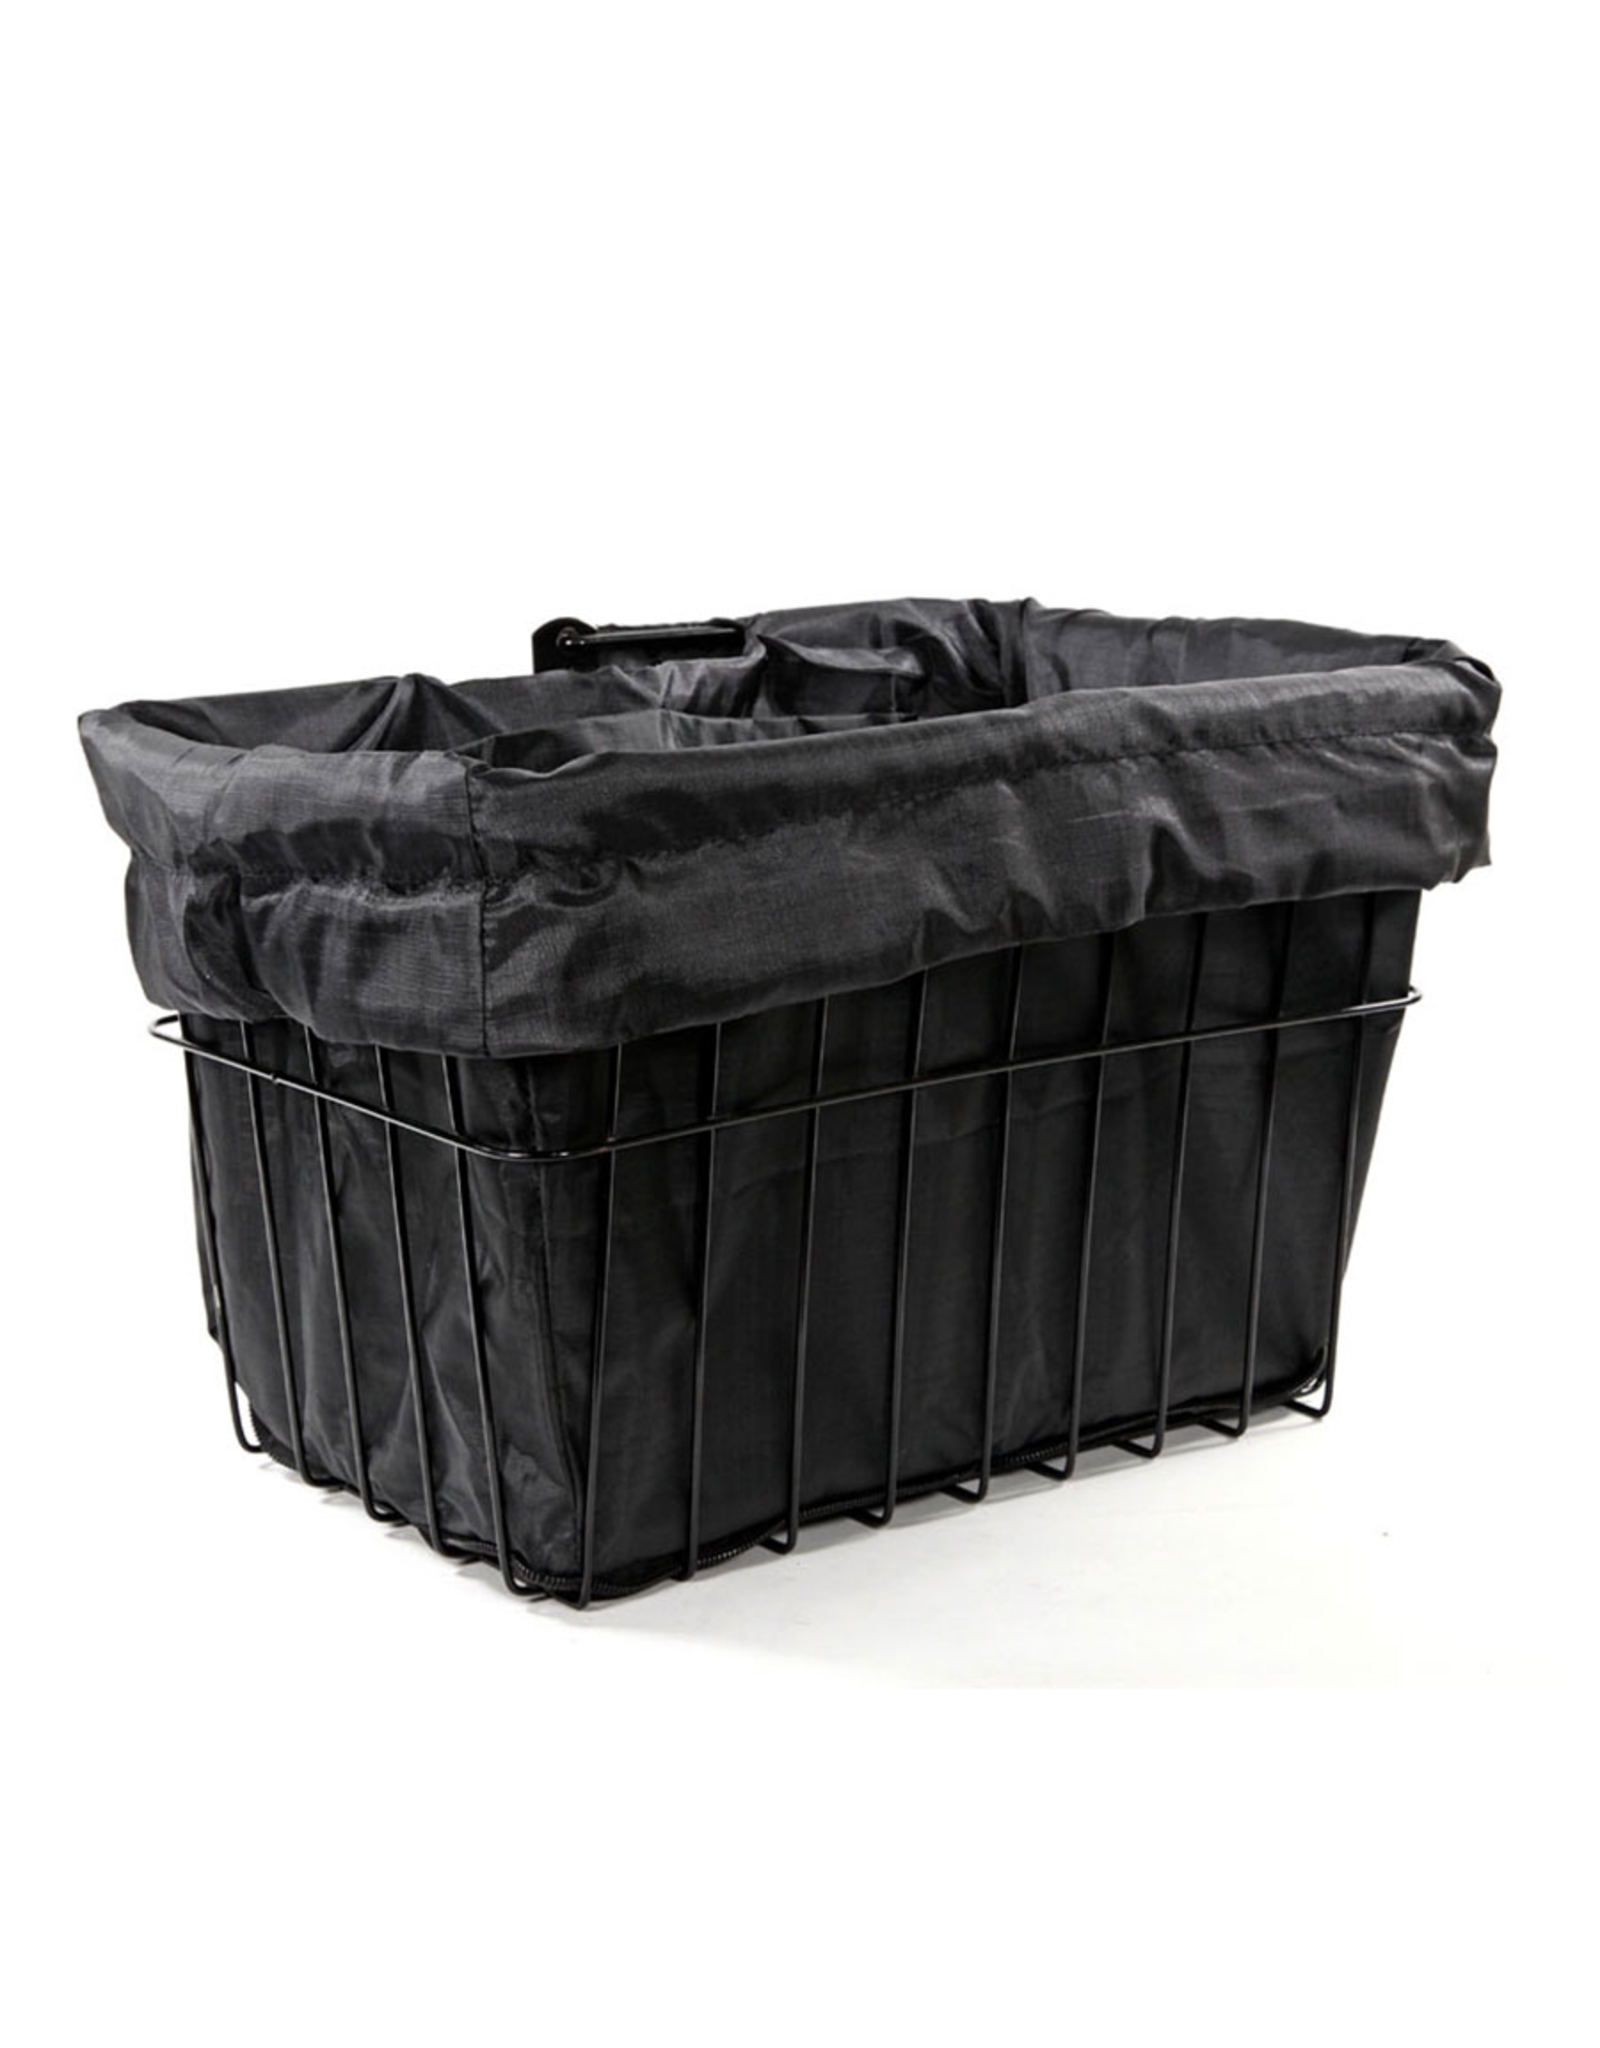 Cruiser Candy Cruiser Candy Basket Liner - Black